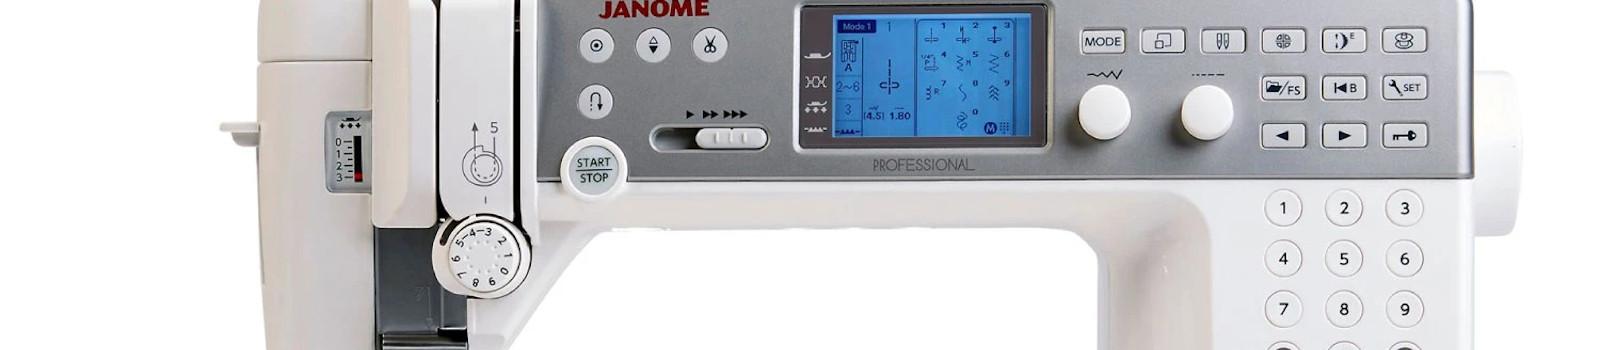 Janome Memory Craft 6700P Embroidery Machine